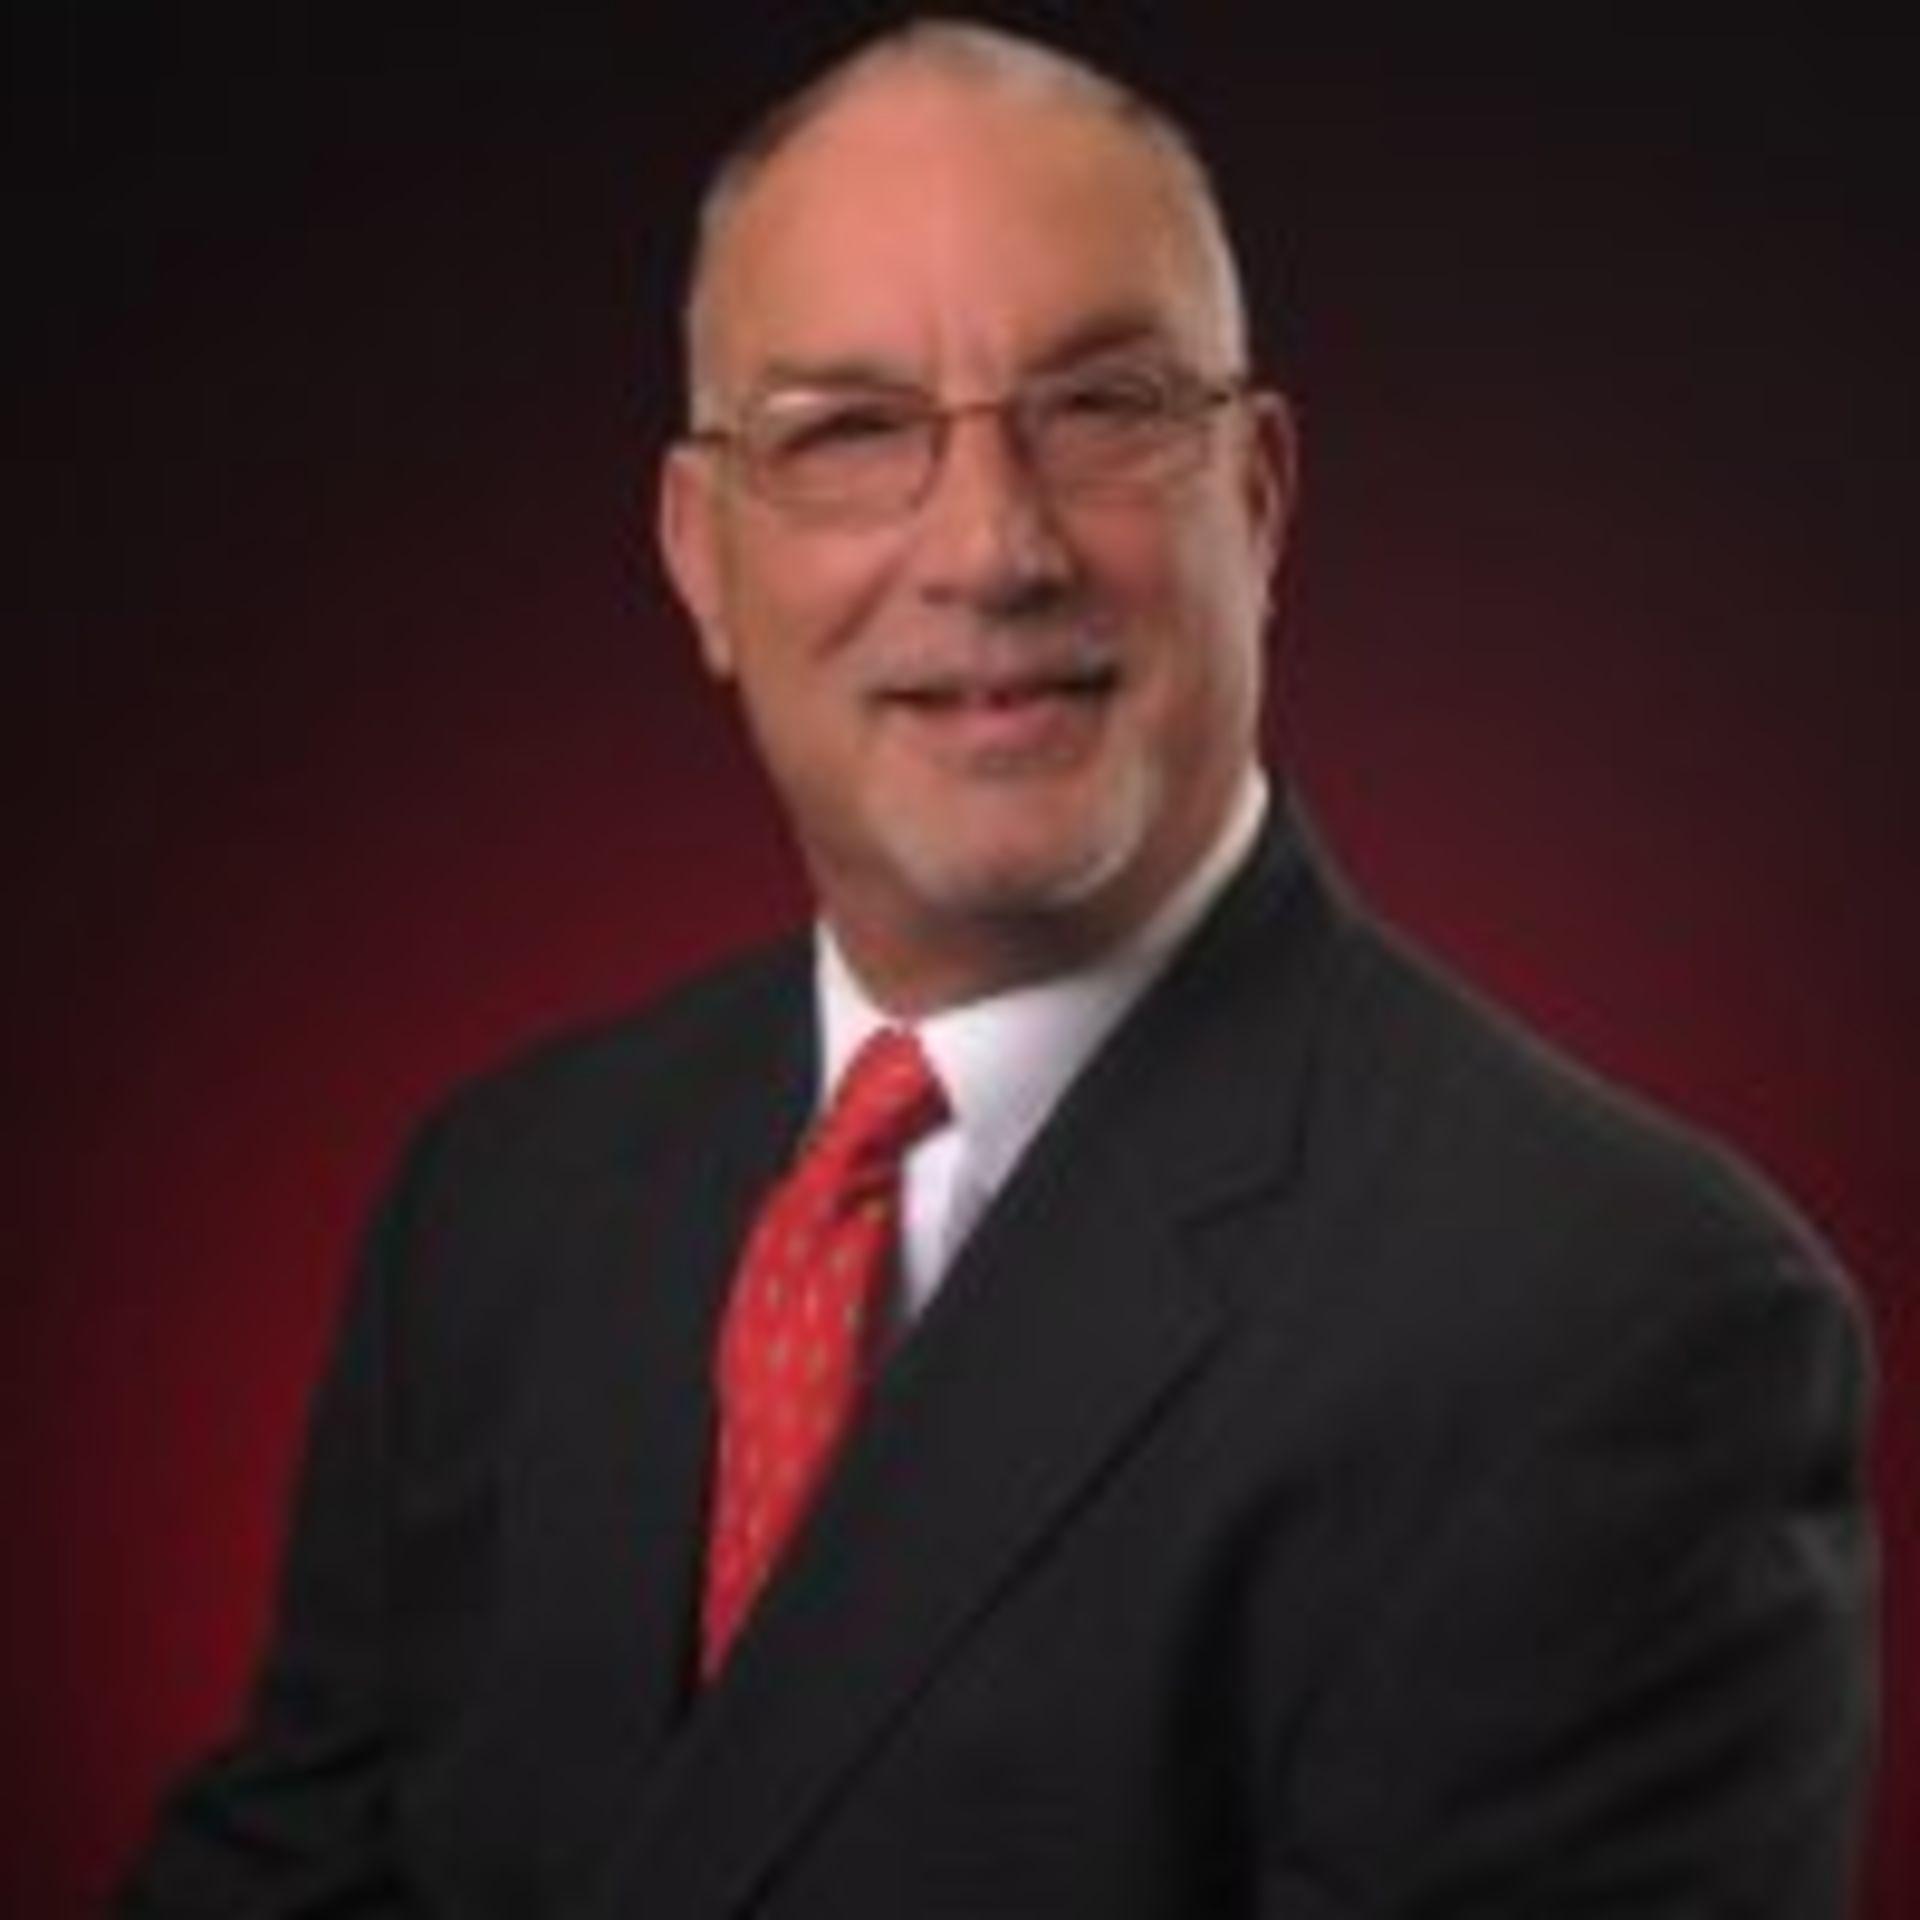 Randy Dillback